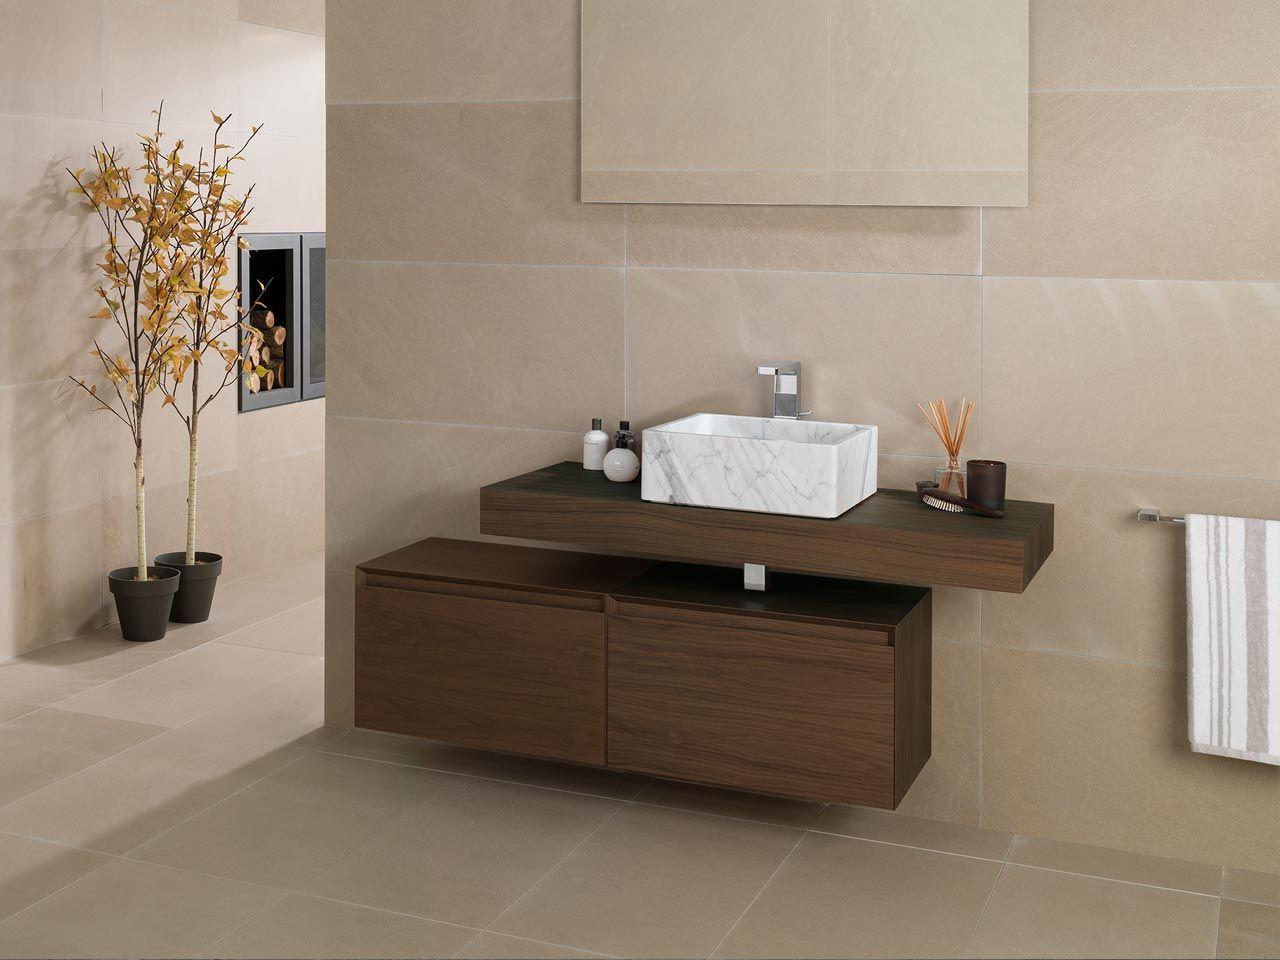 Porcelanosa Banos.Mobiliario Bano Porcelanosa In 2019 Taupe Bathroom